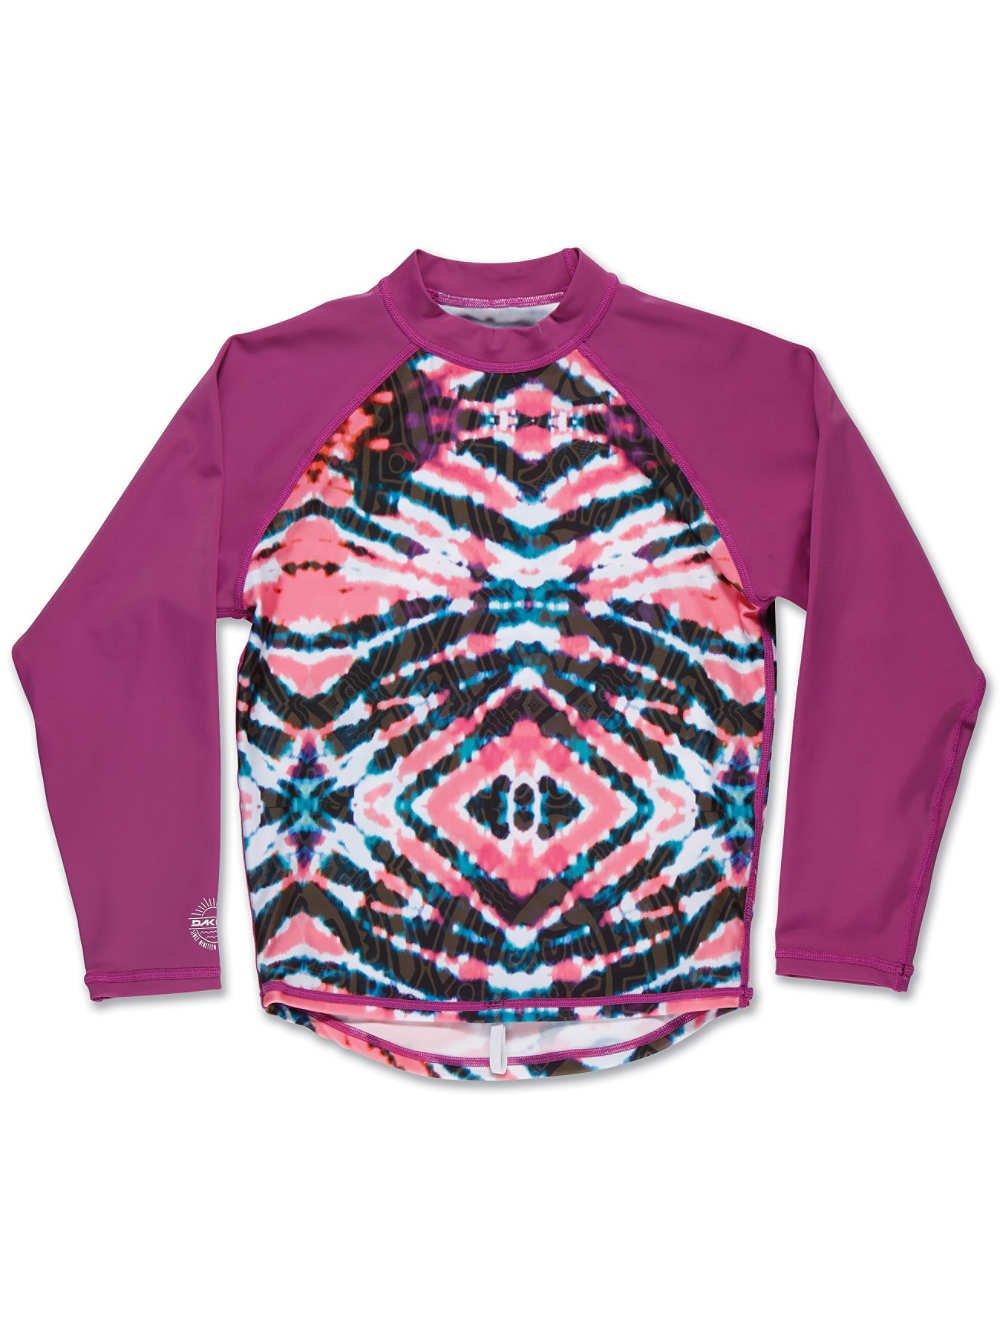 Dakine Girl's Classic Long Sleeve Rashguard Shirt, Watermelon Burst, 8